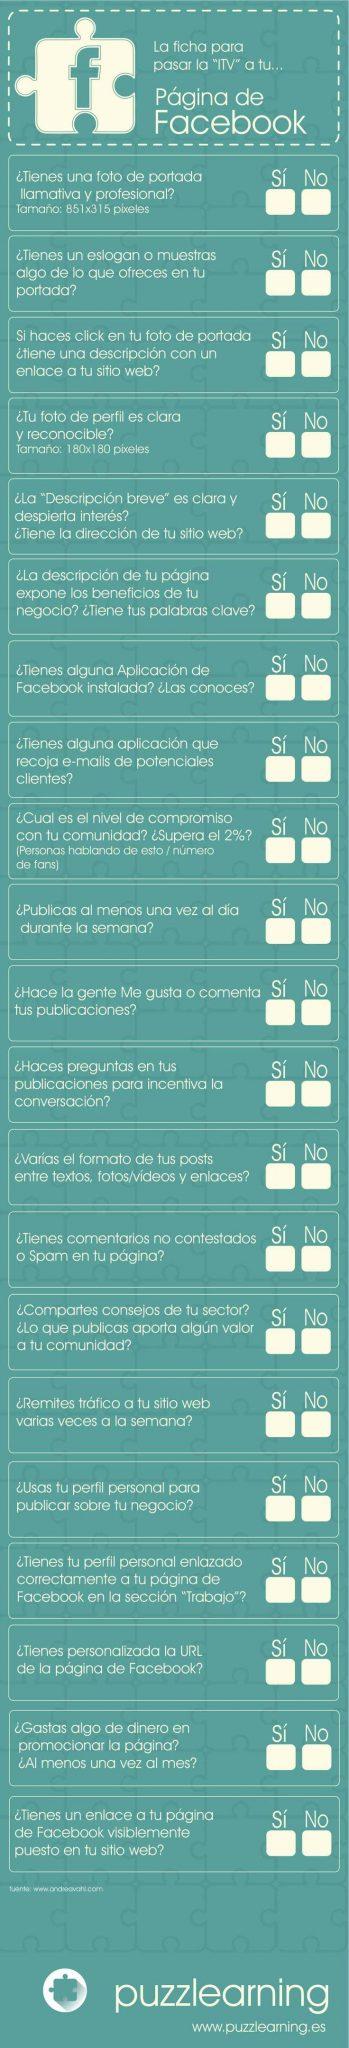 questionarioFacebook